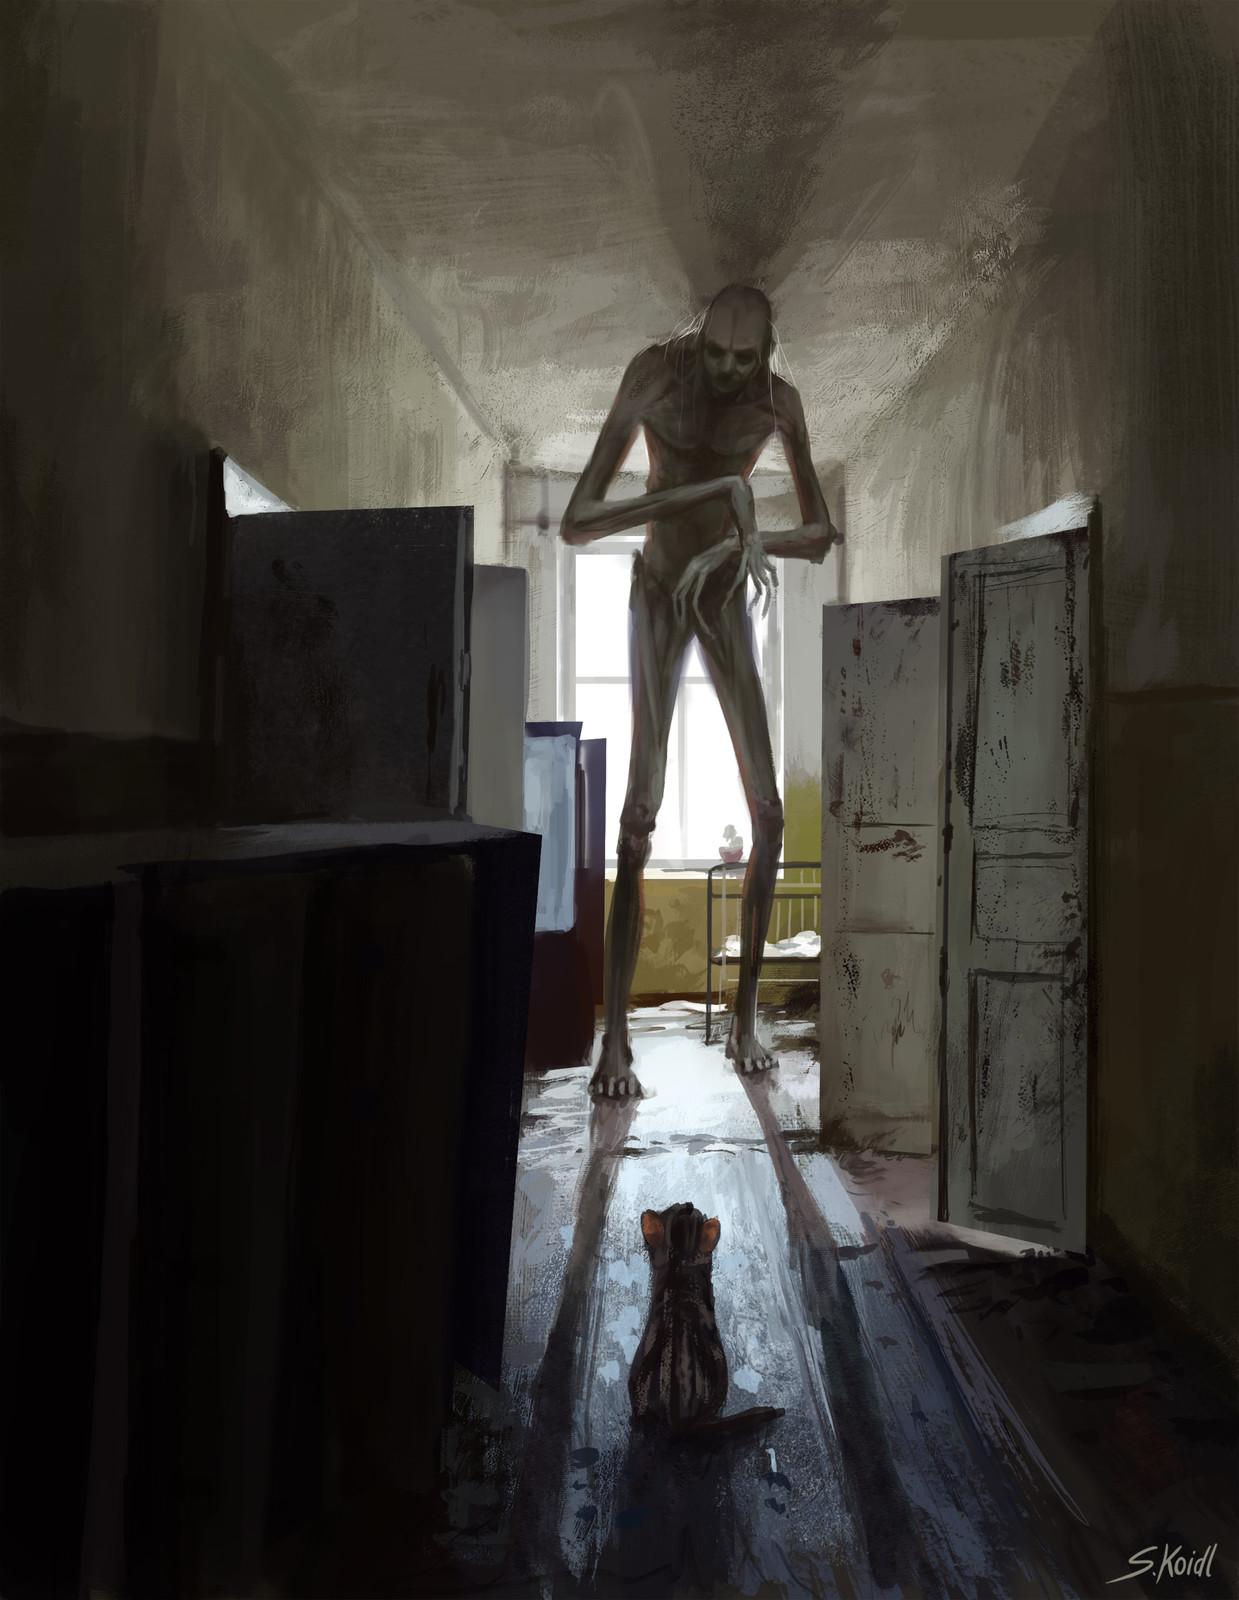 A Chernobyl Horror Story 3